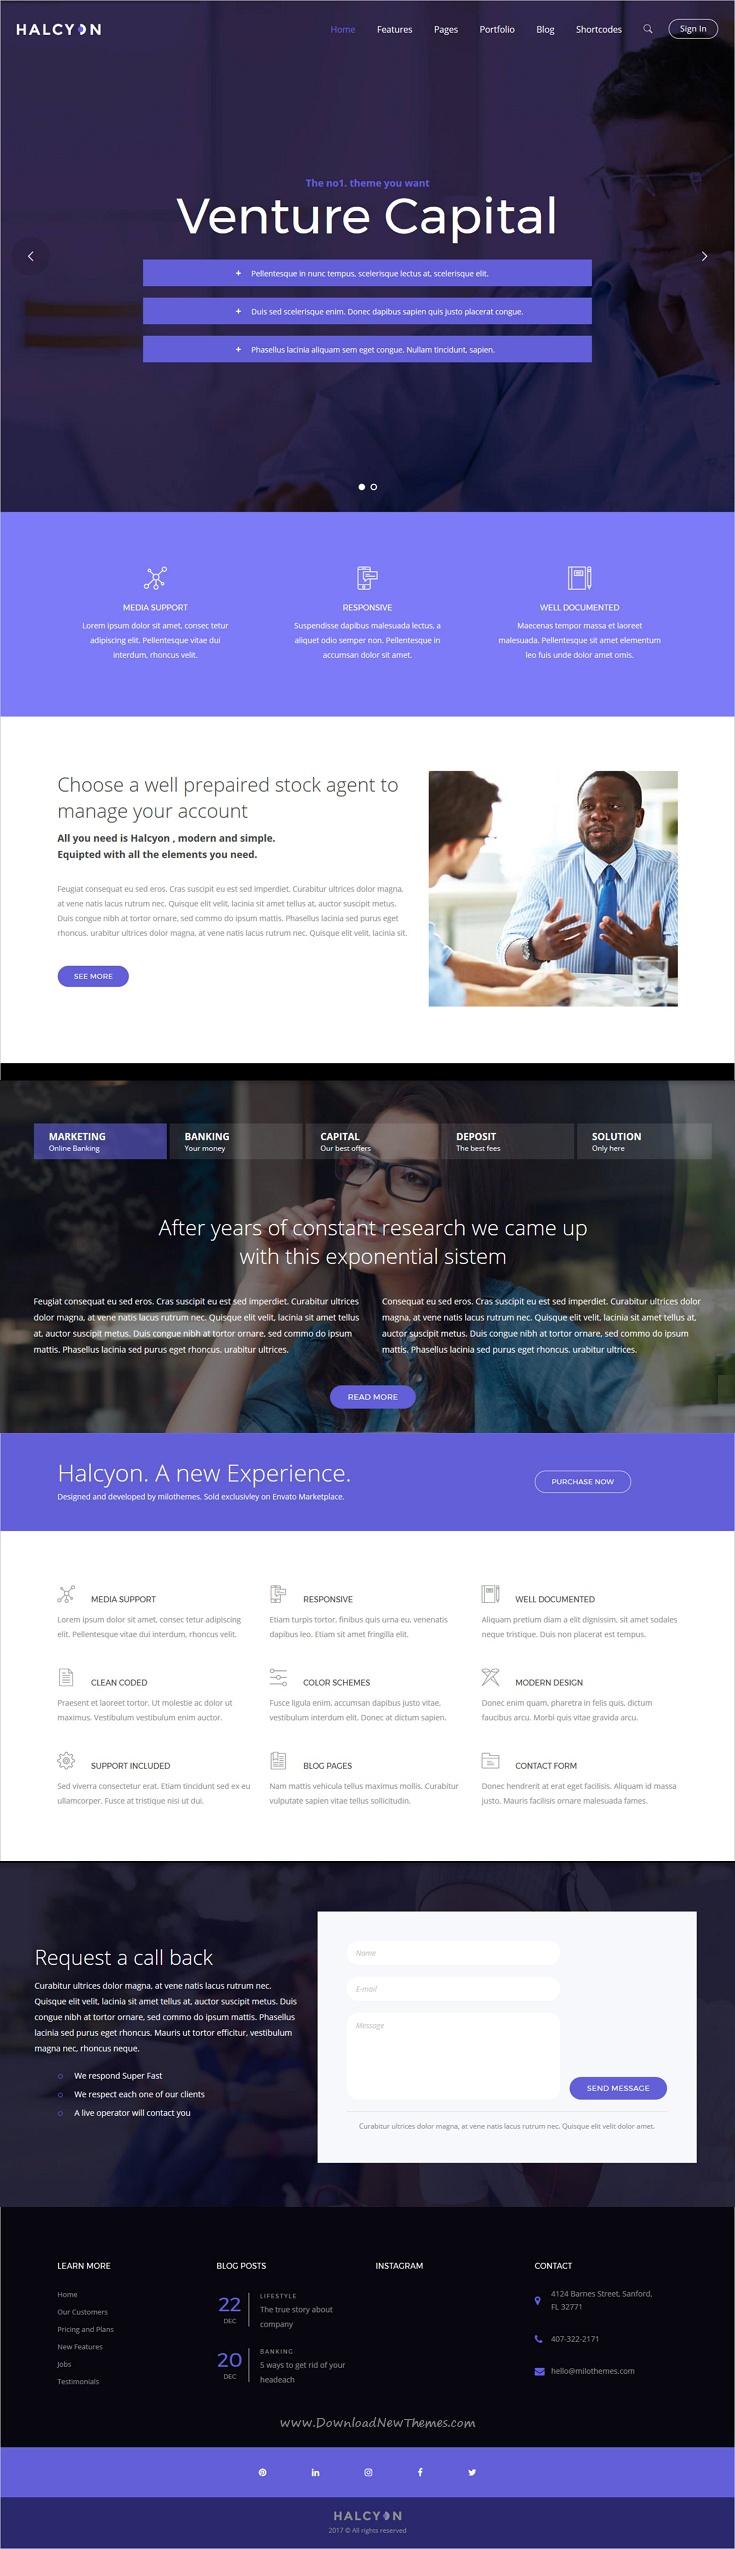 Hilcy Responsive HTML Template Pinterest Business Website - Venture capital website template